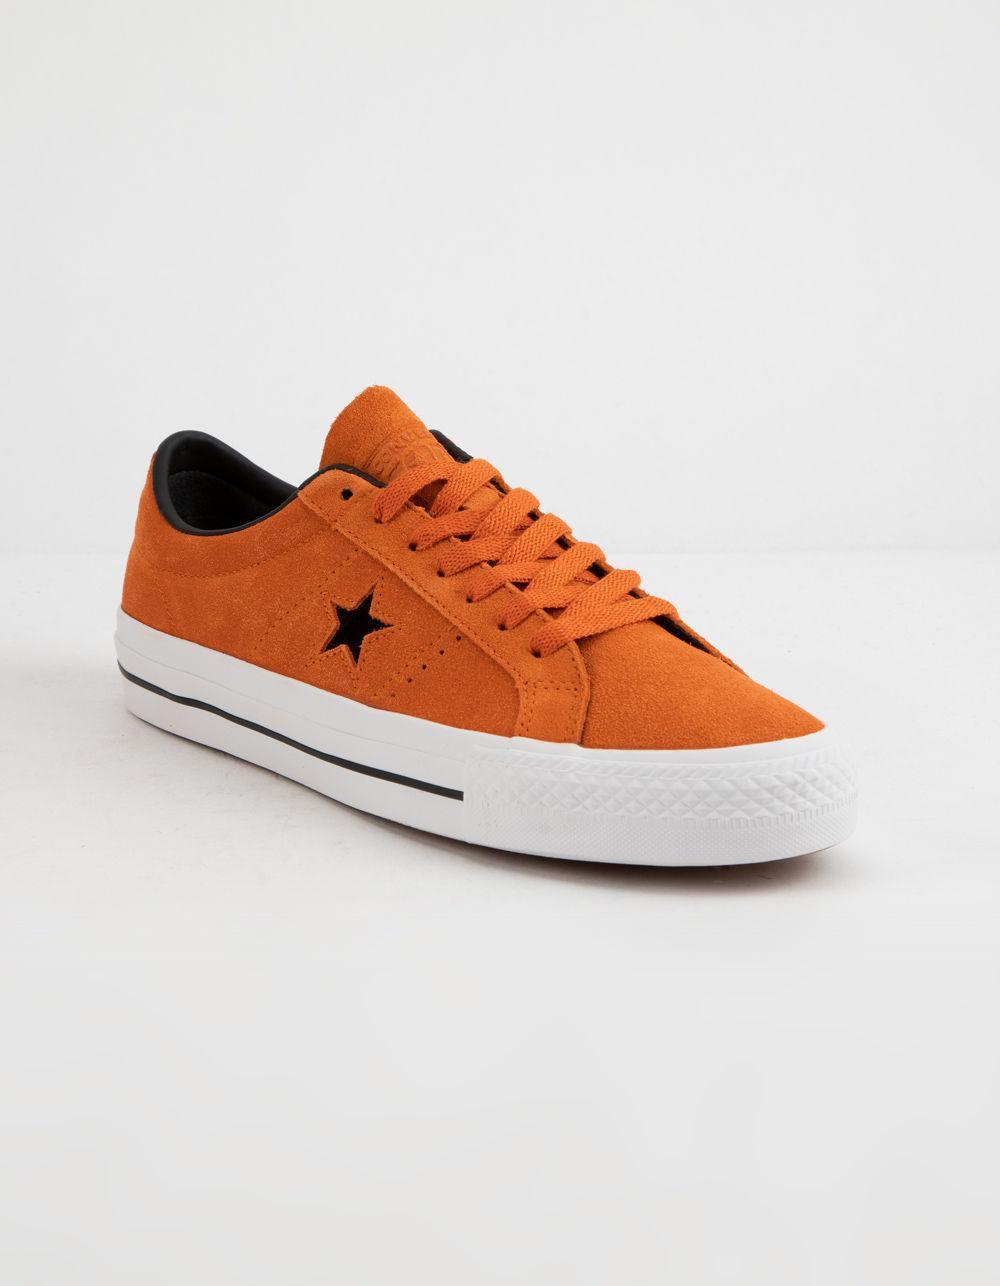 839cdb7edf7a0a Lyst - Converse One Star Pro Ox Campfire Orange Shoes in Orange for Men